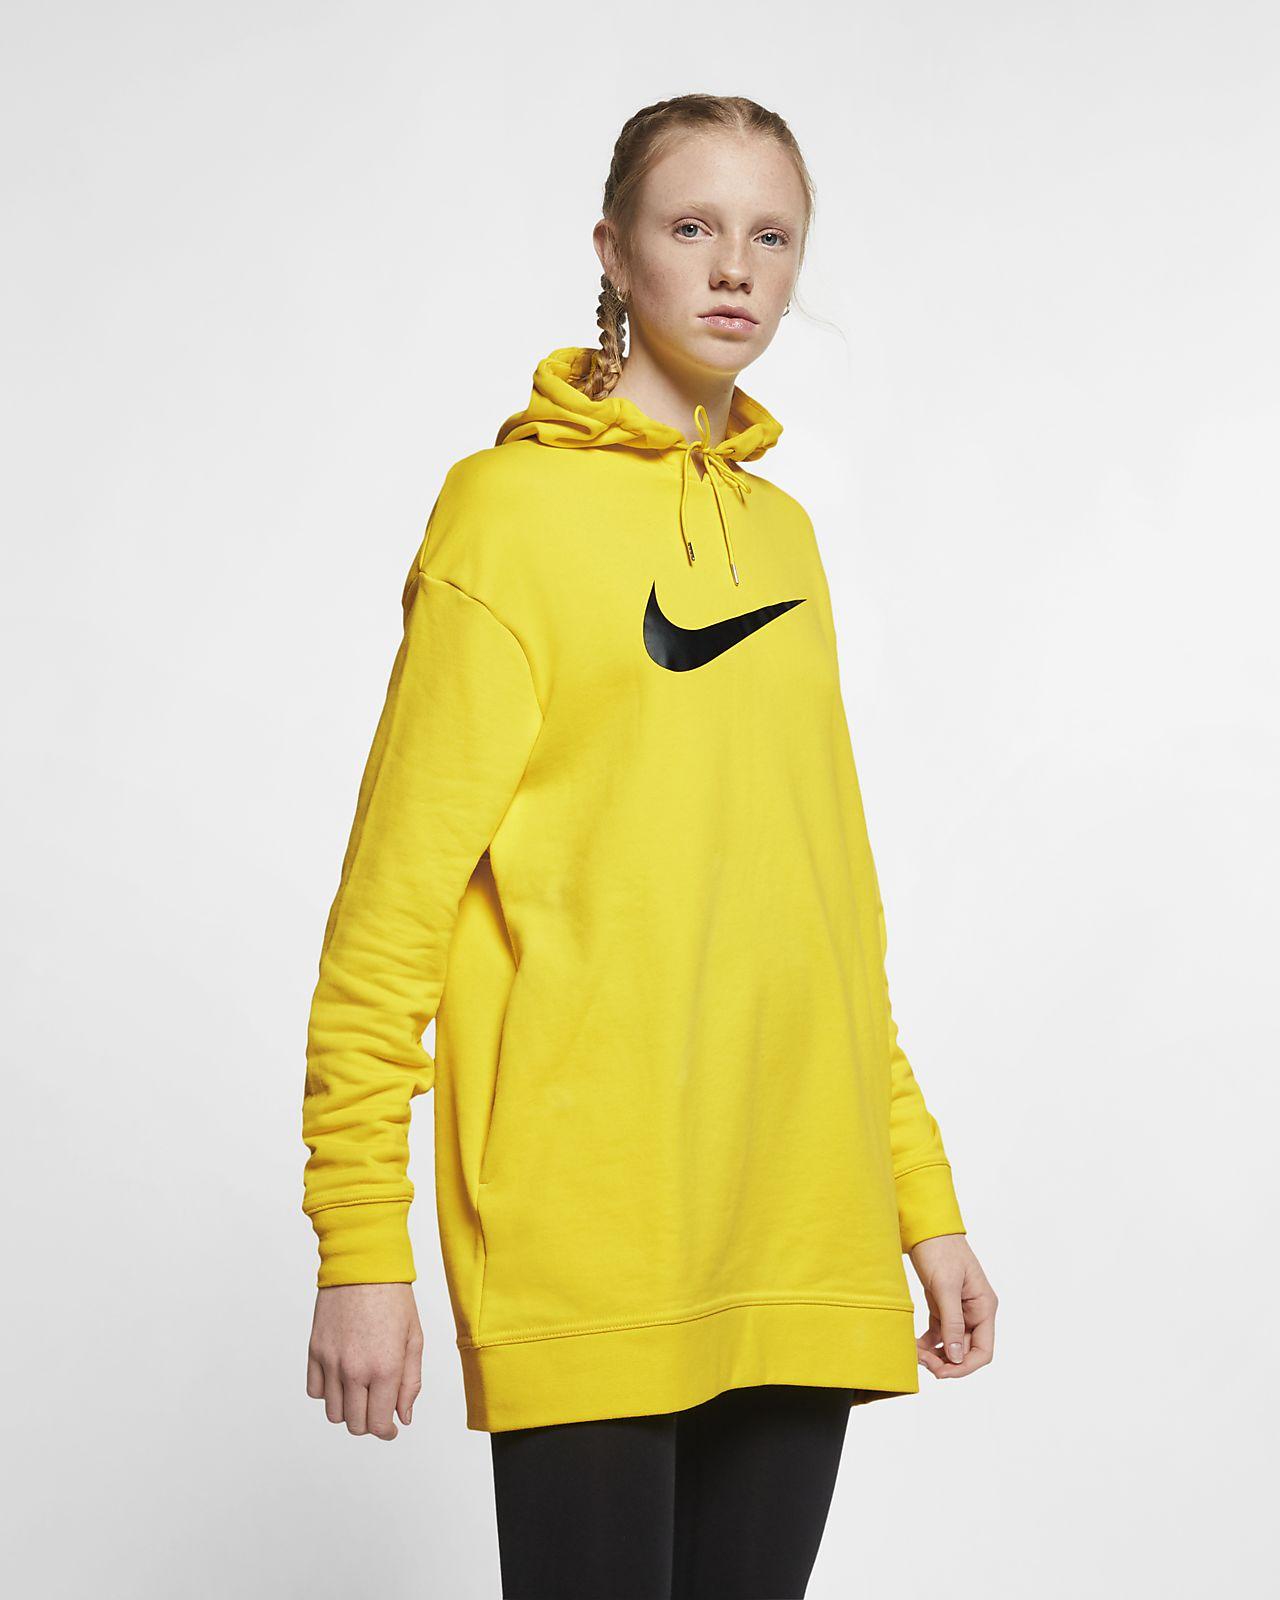 Sudadera con capucha de felpa francesa para mujer Nike Sportswear Swoosh